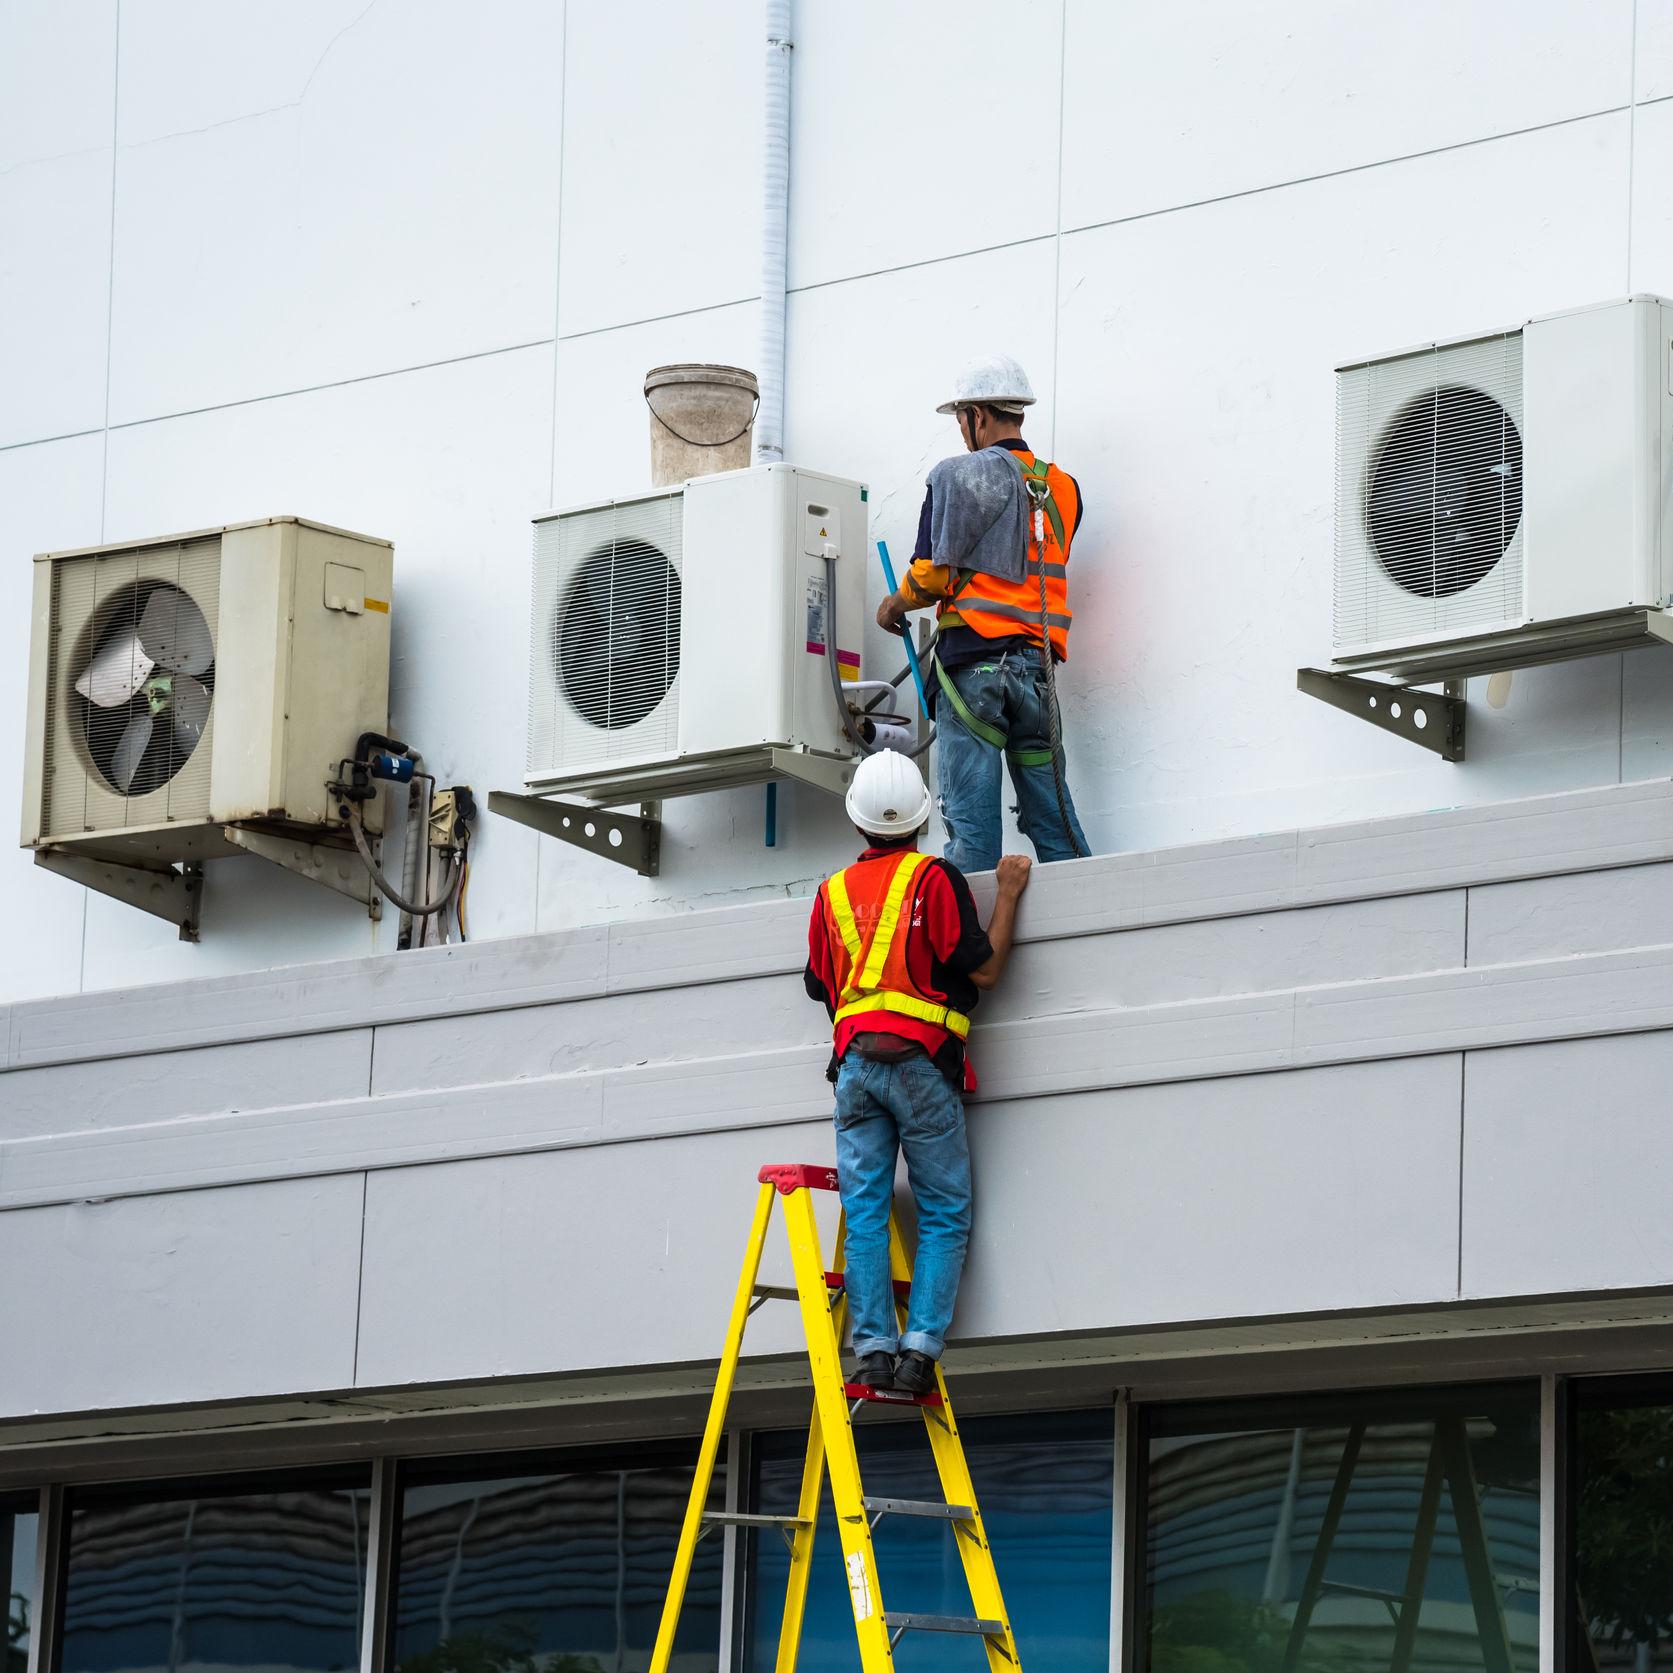 Technicians repairing an air conditioner